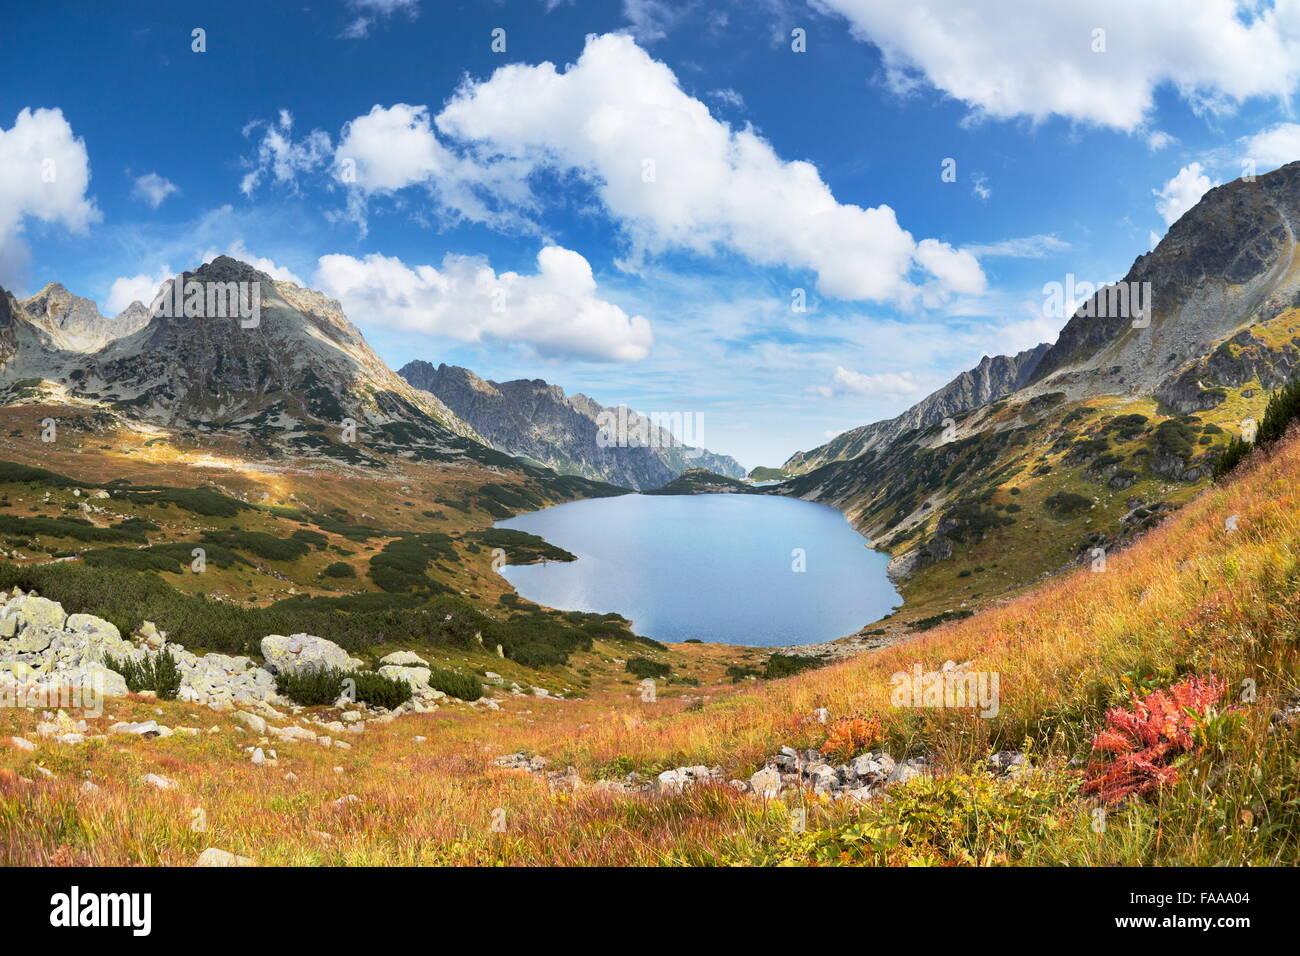 Las montañas Tatra, Valle de 5 Lagos, Polonia Imagen De Stock